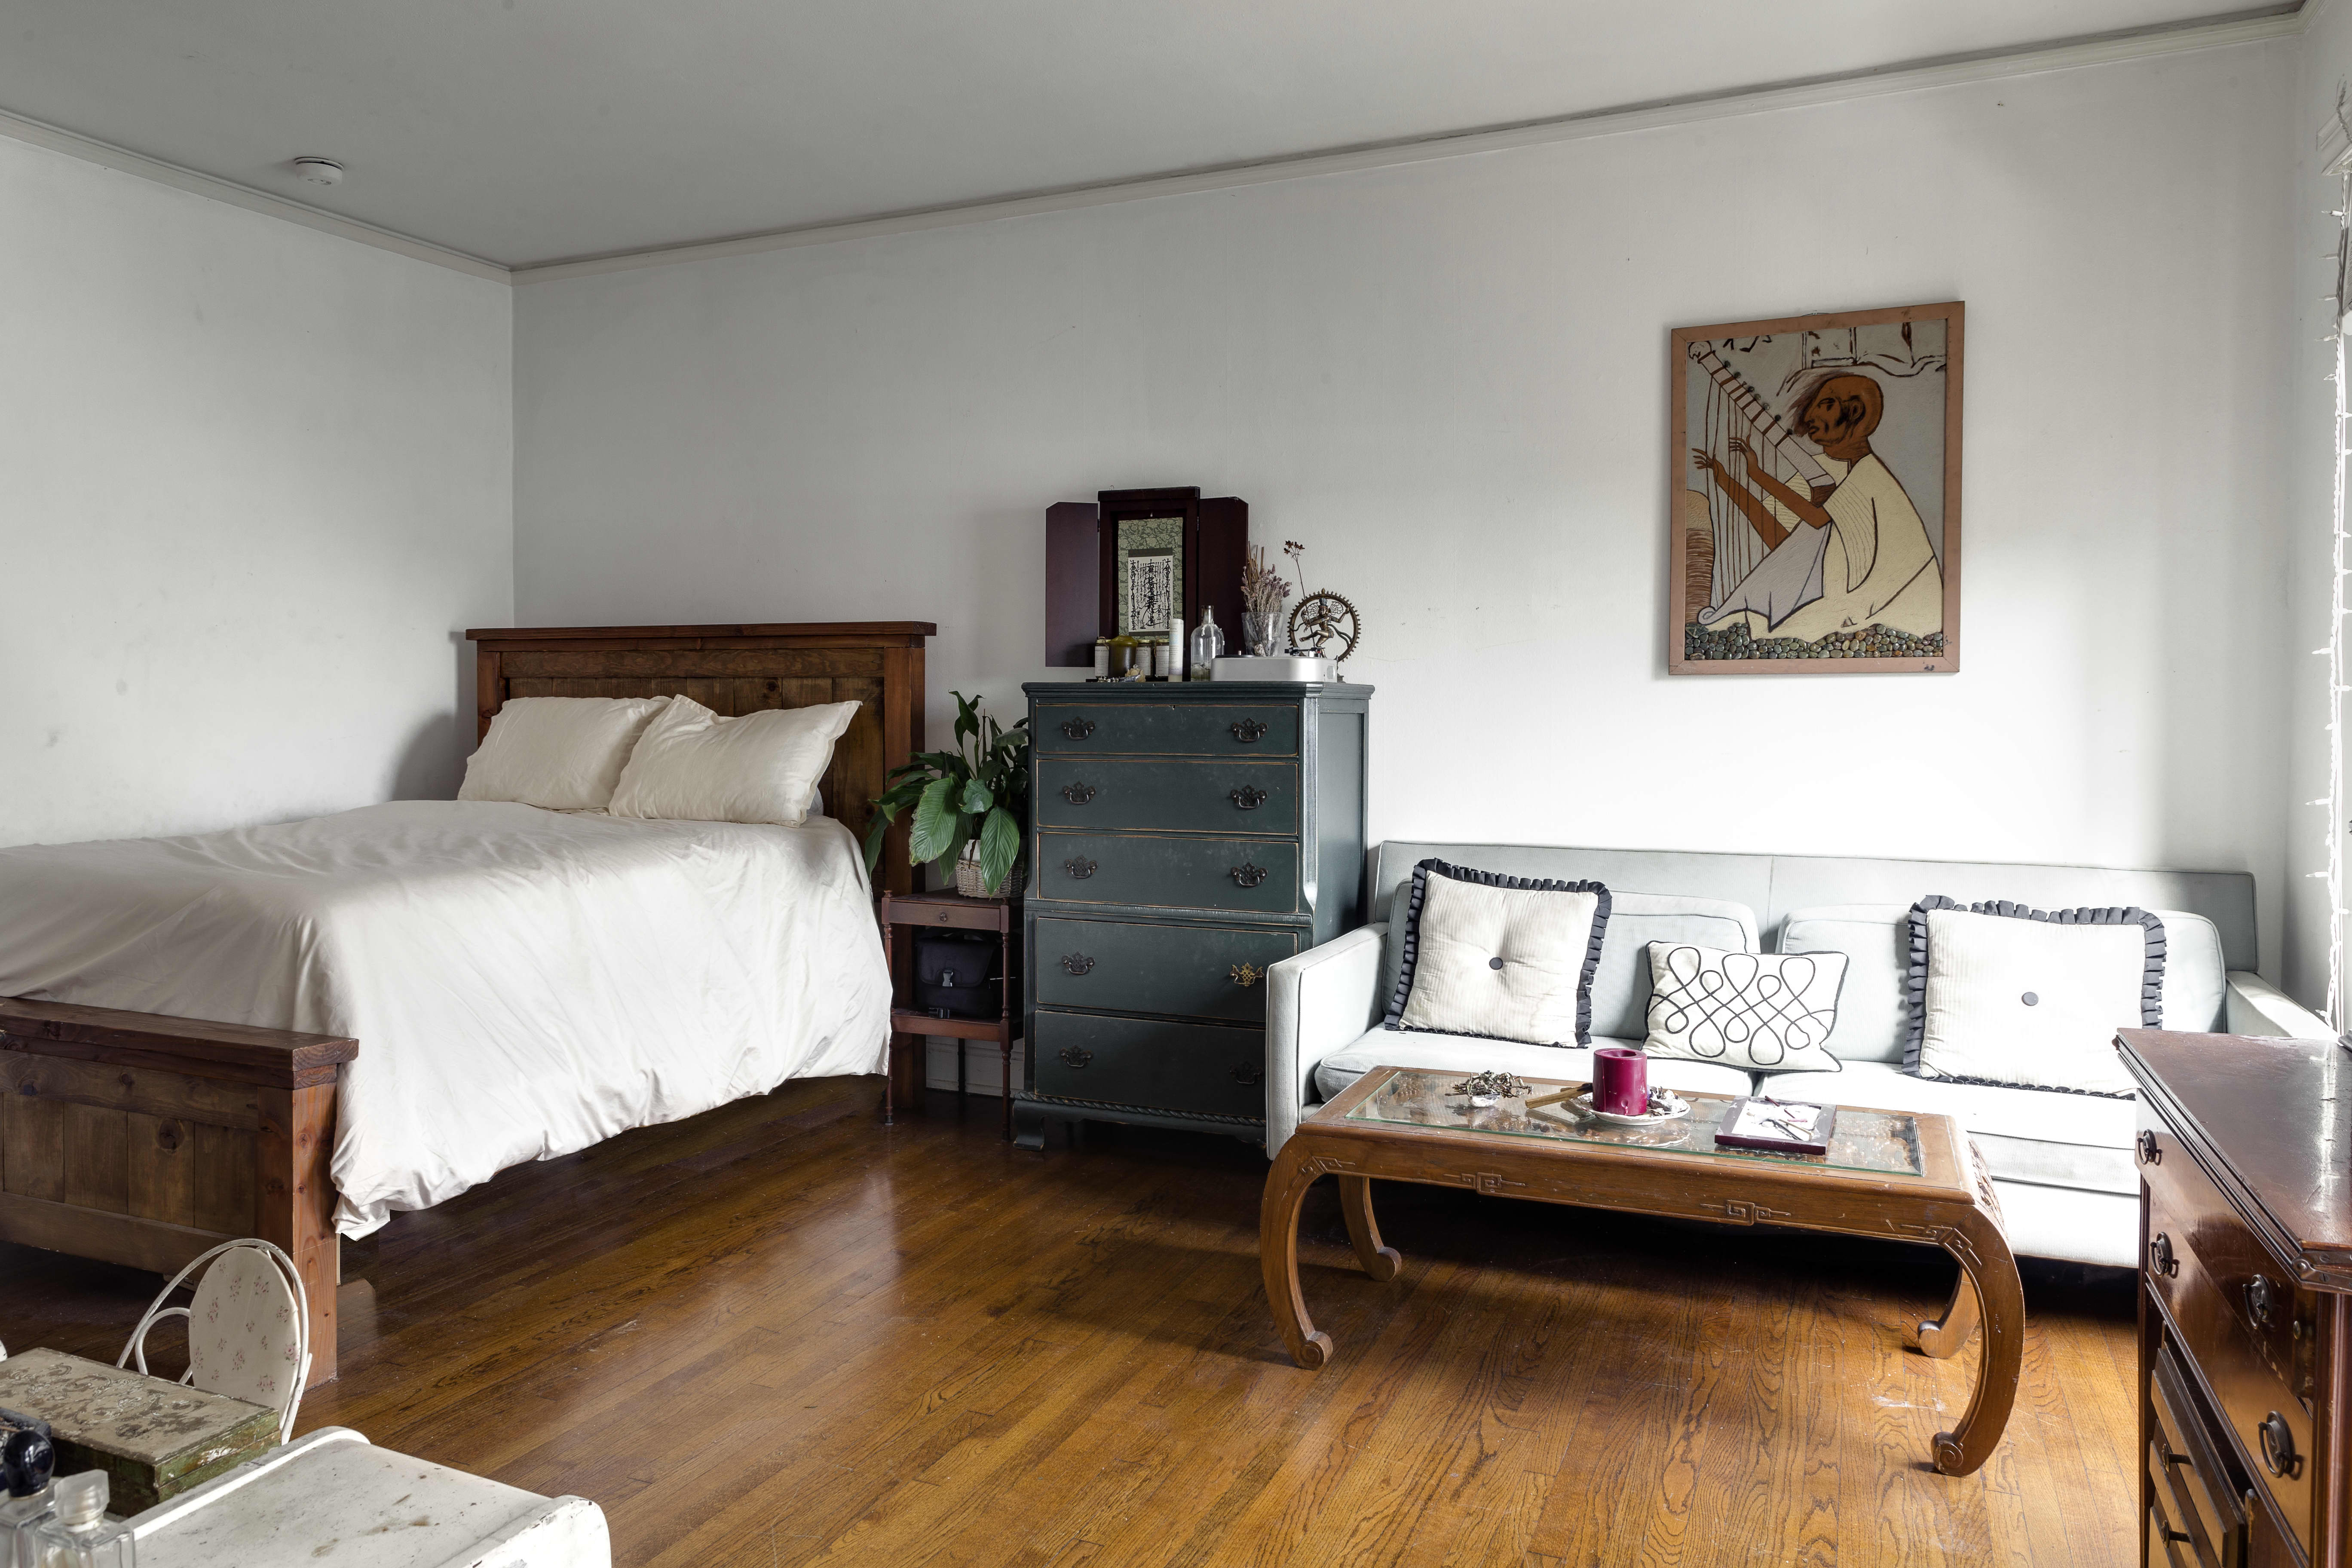 House tour a 500 square foot california studio apartment - 500 square foot apartment ...